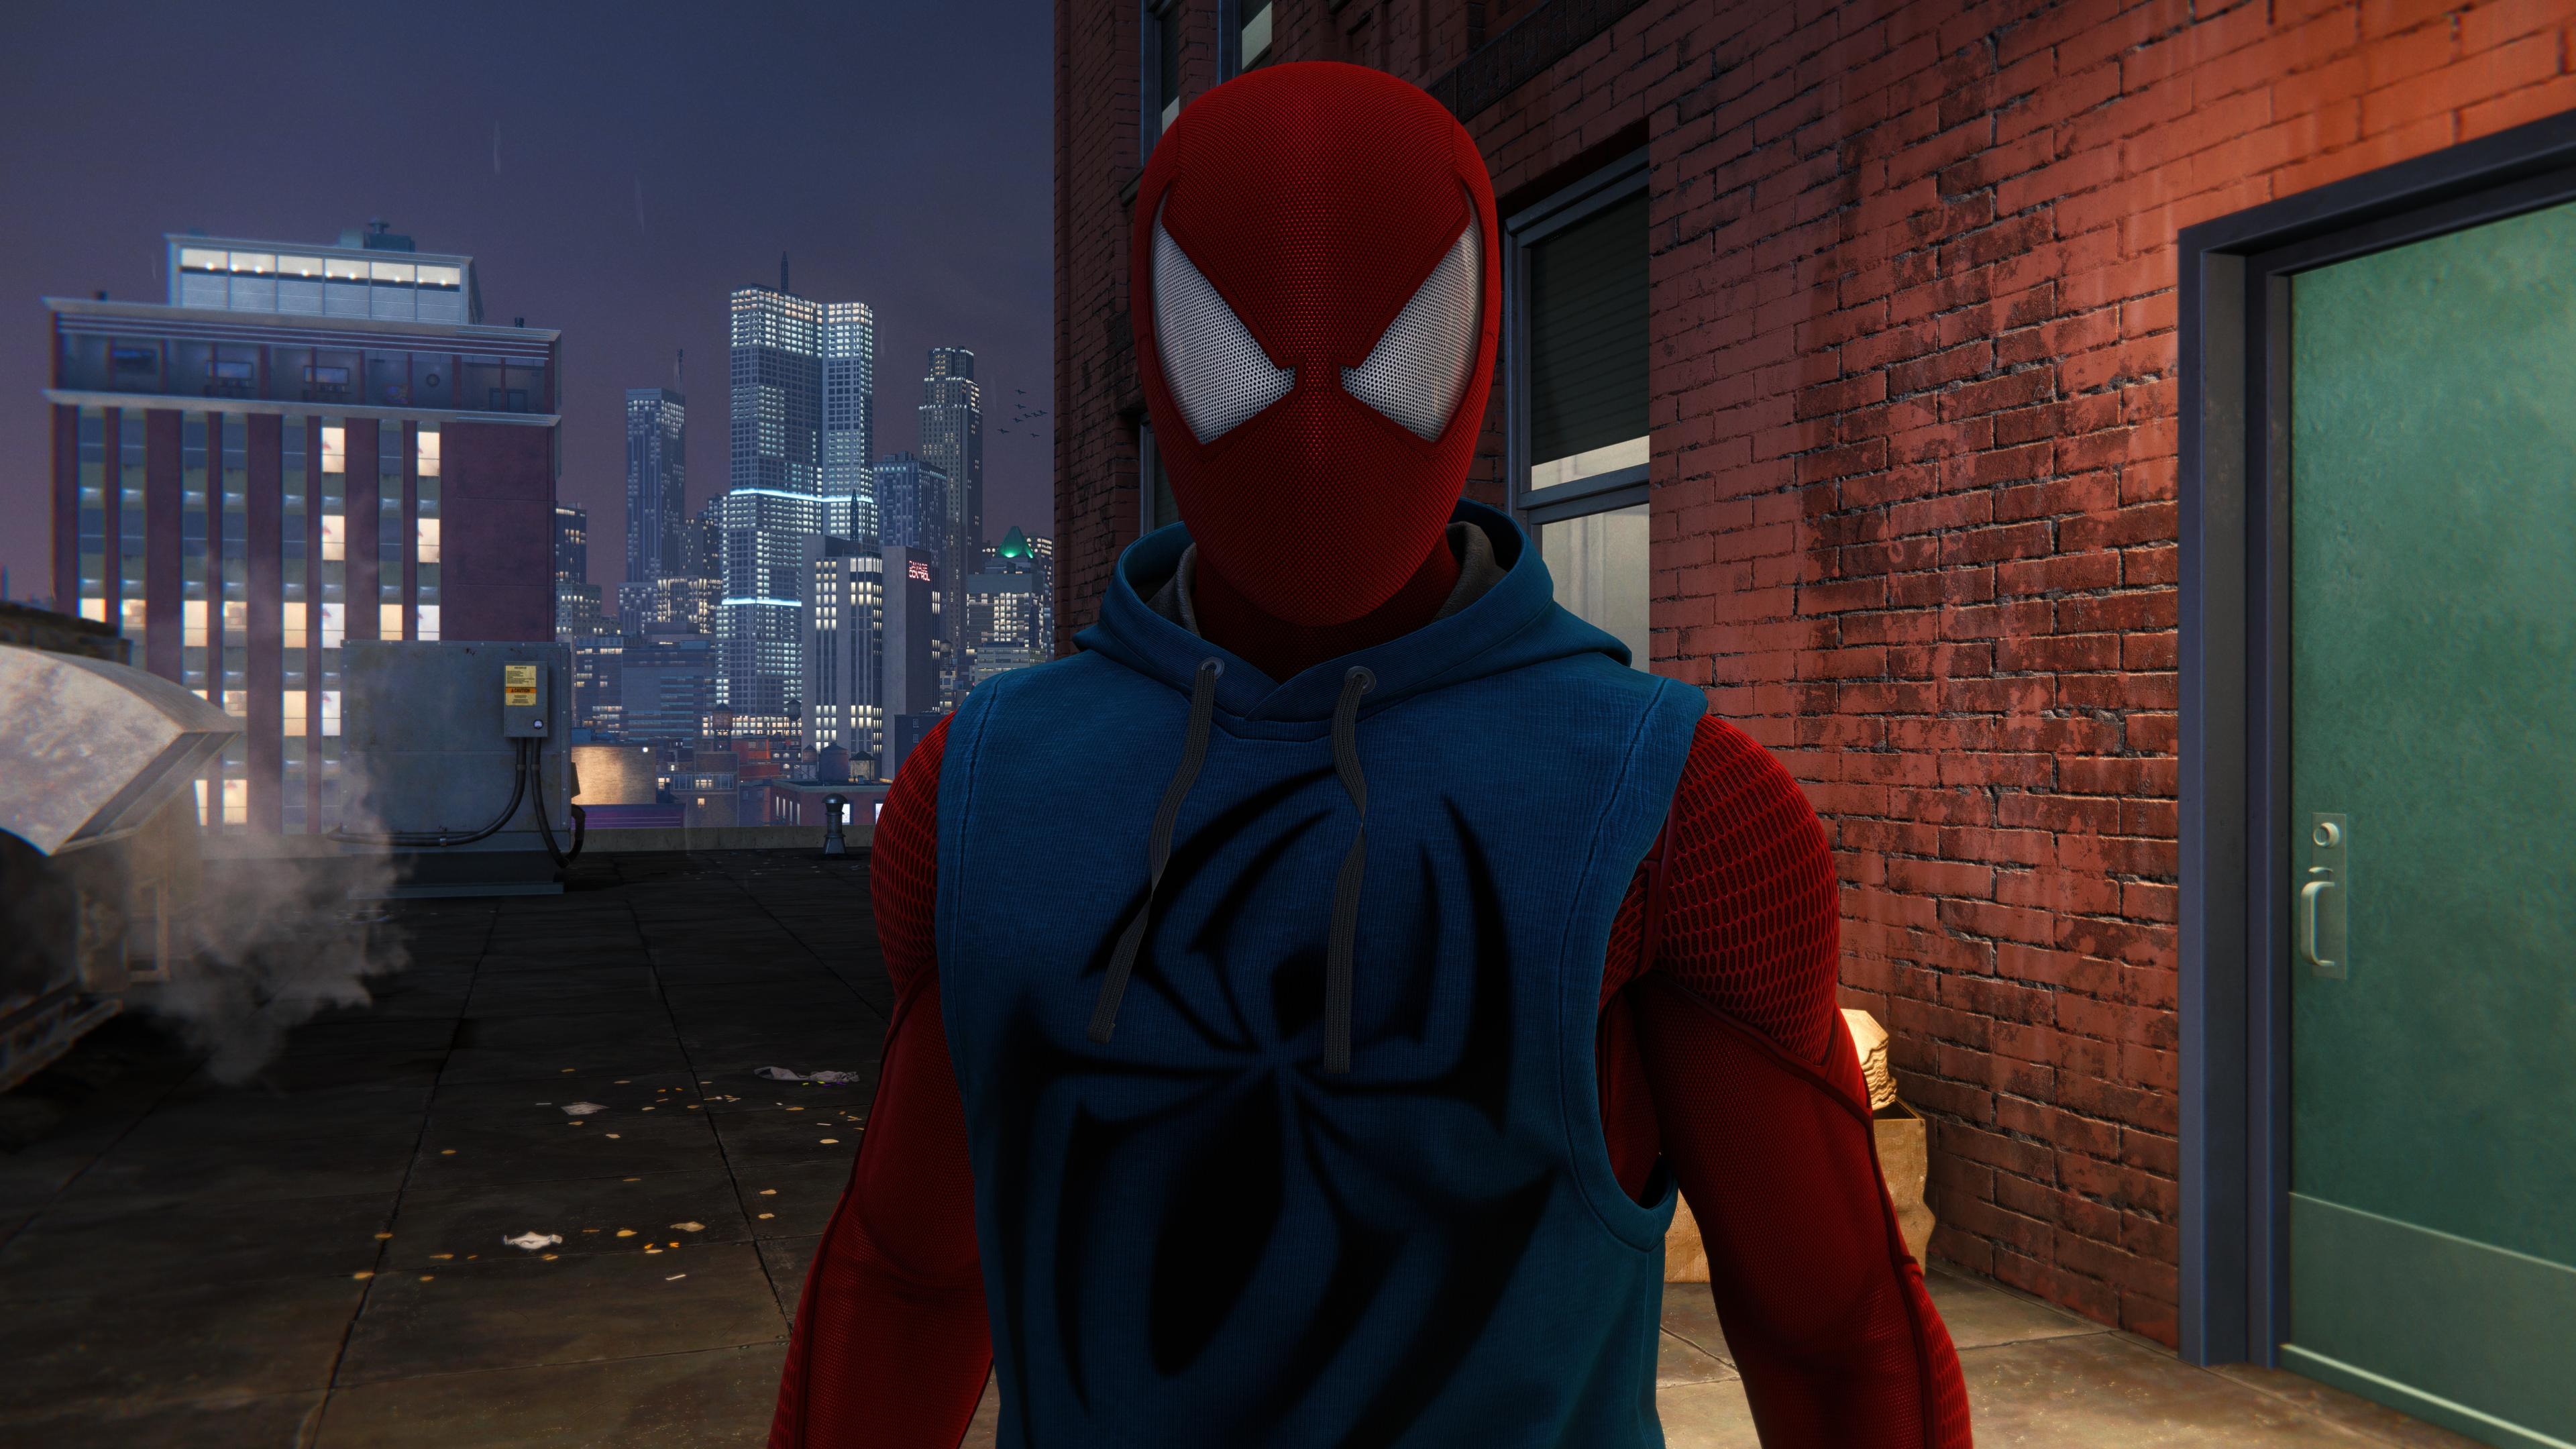 https://i.ibb.co/ynwcbmb/Marvel-s-Spider-Man-Remastered-20210511231928.jpg